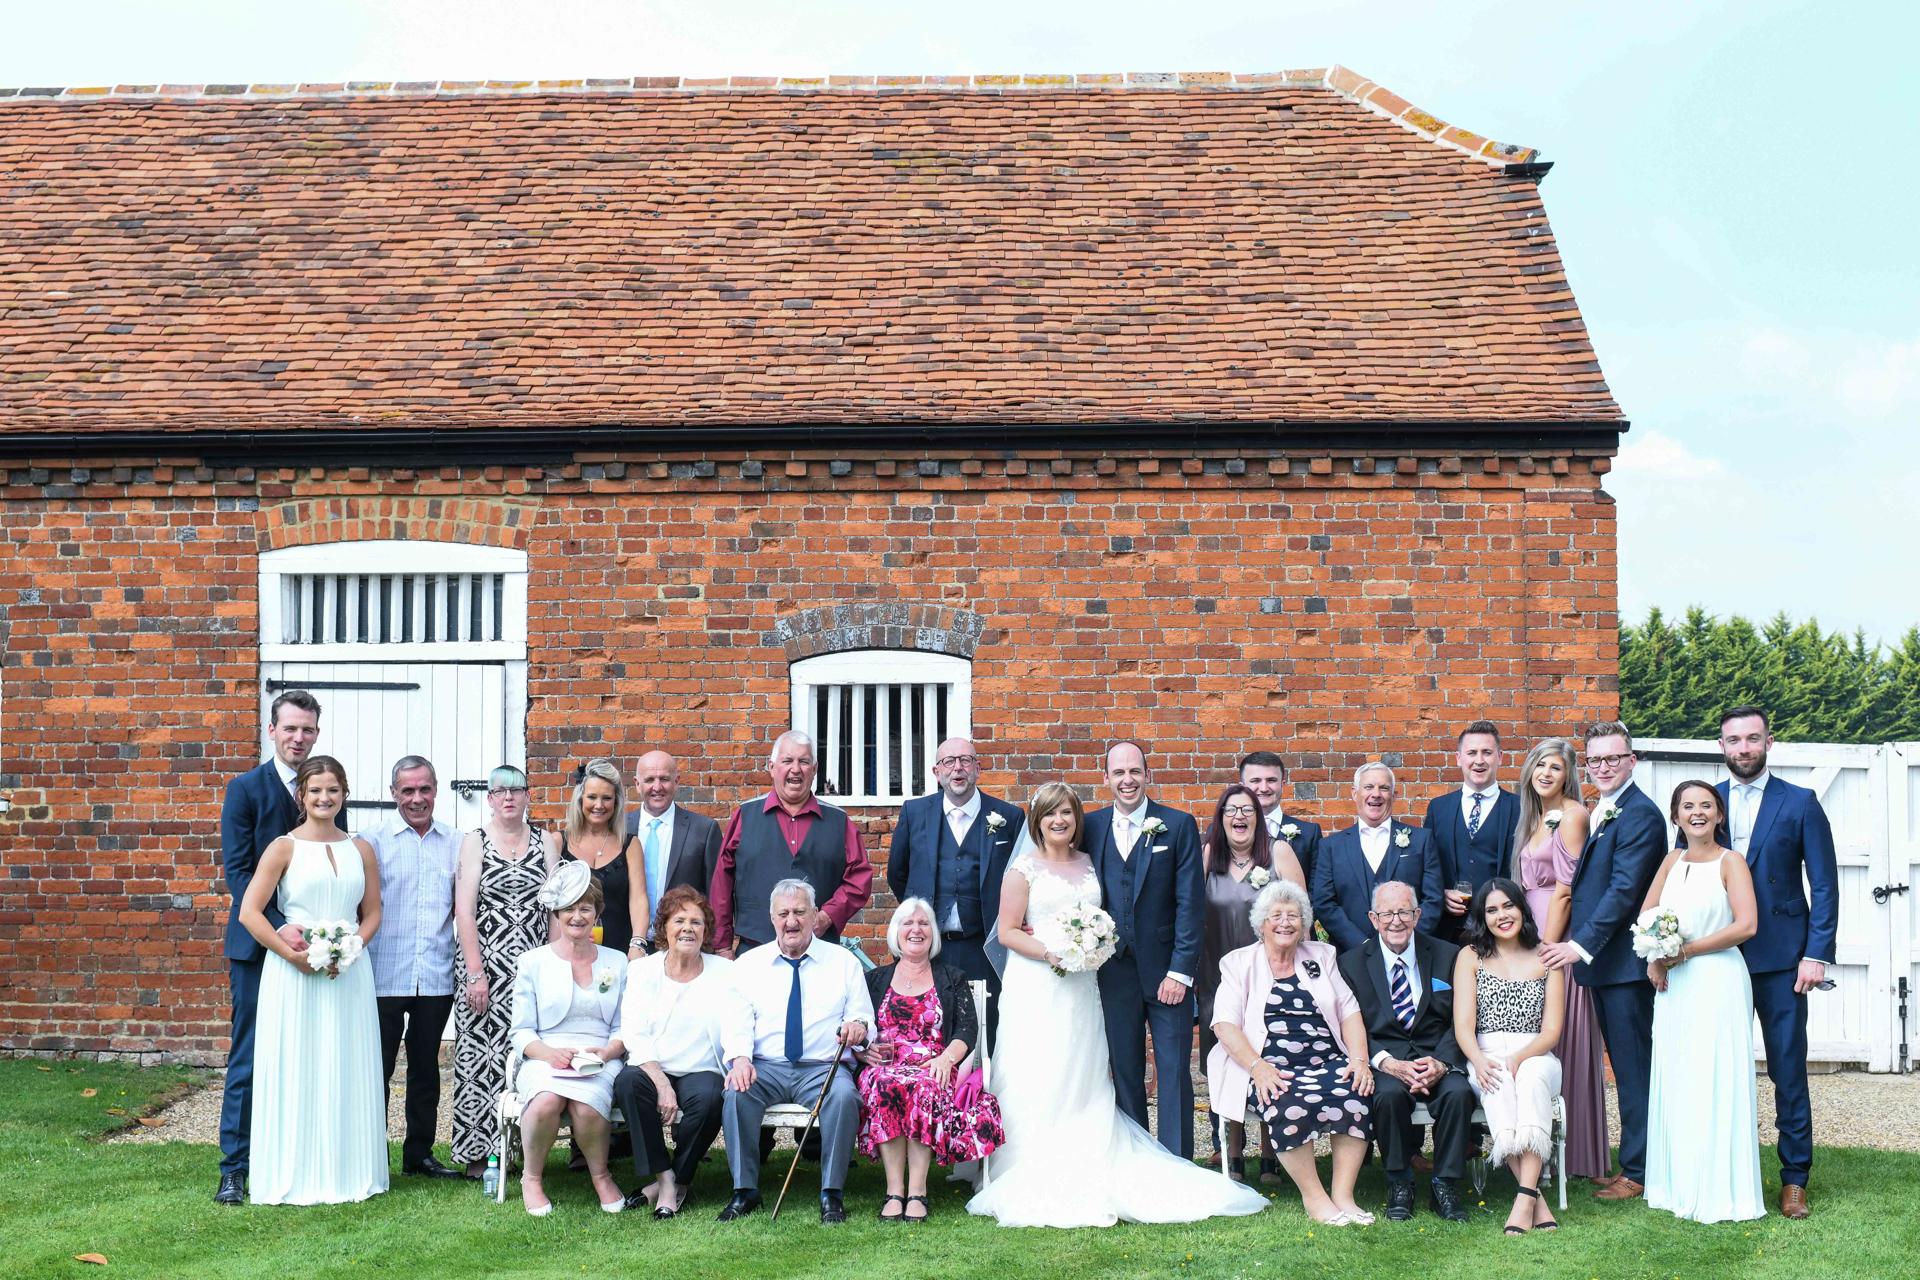 Lillibrook Manor Barn Wedding, Maidenhead, Alexandria Hall Photography (47 of 82).jpg